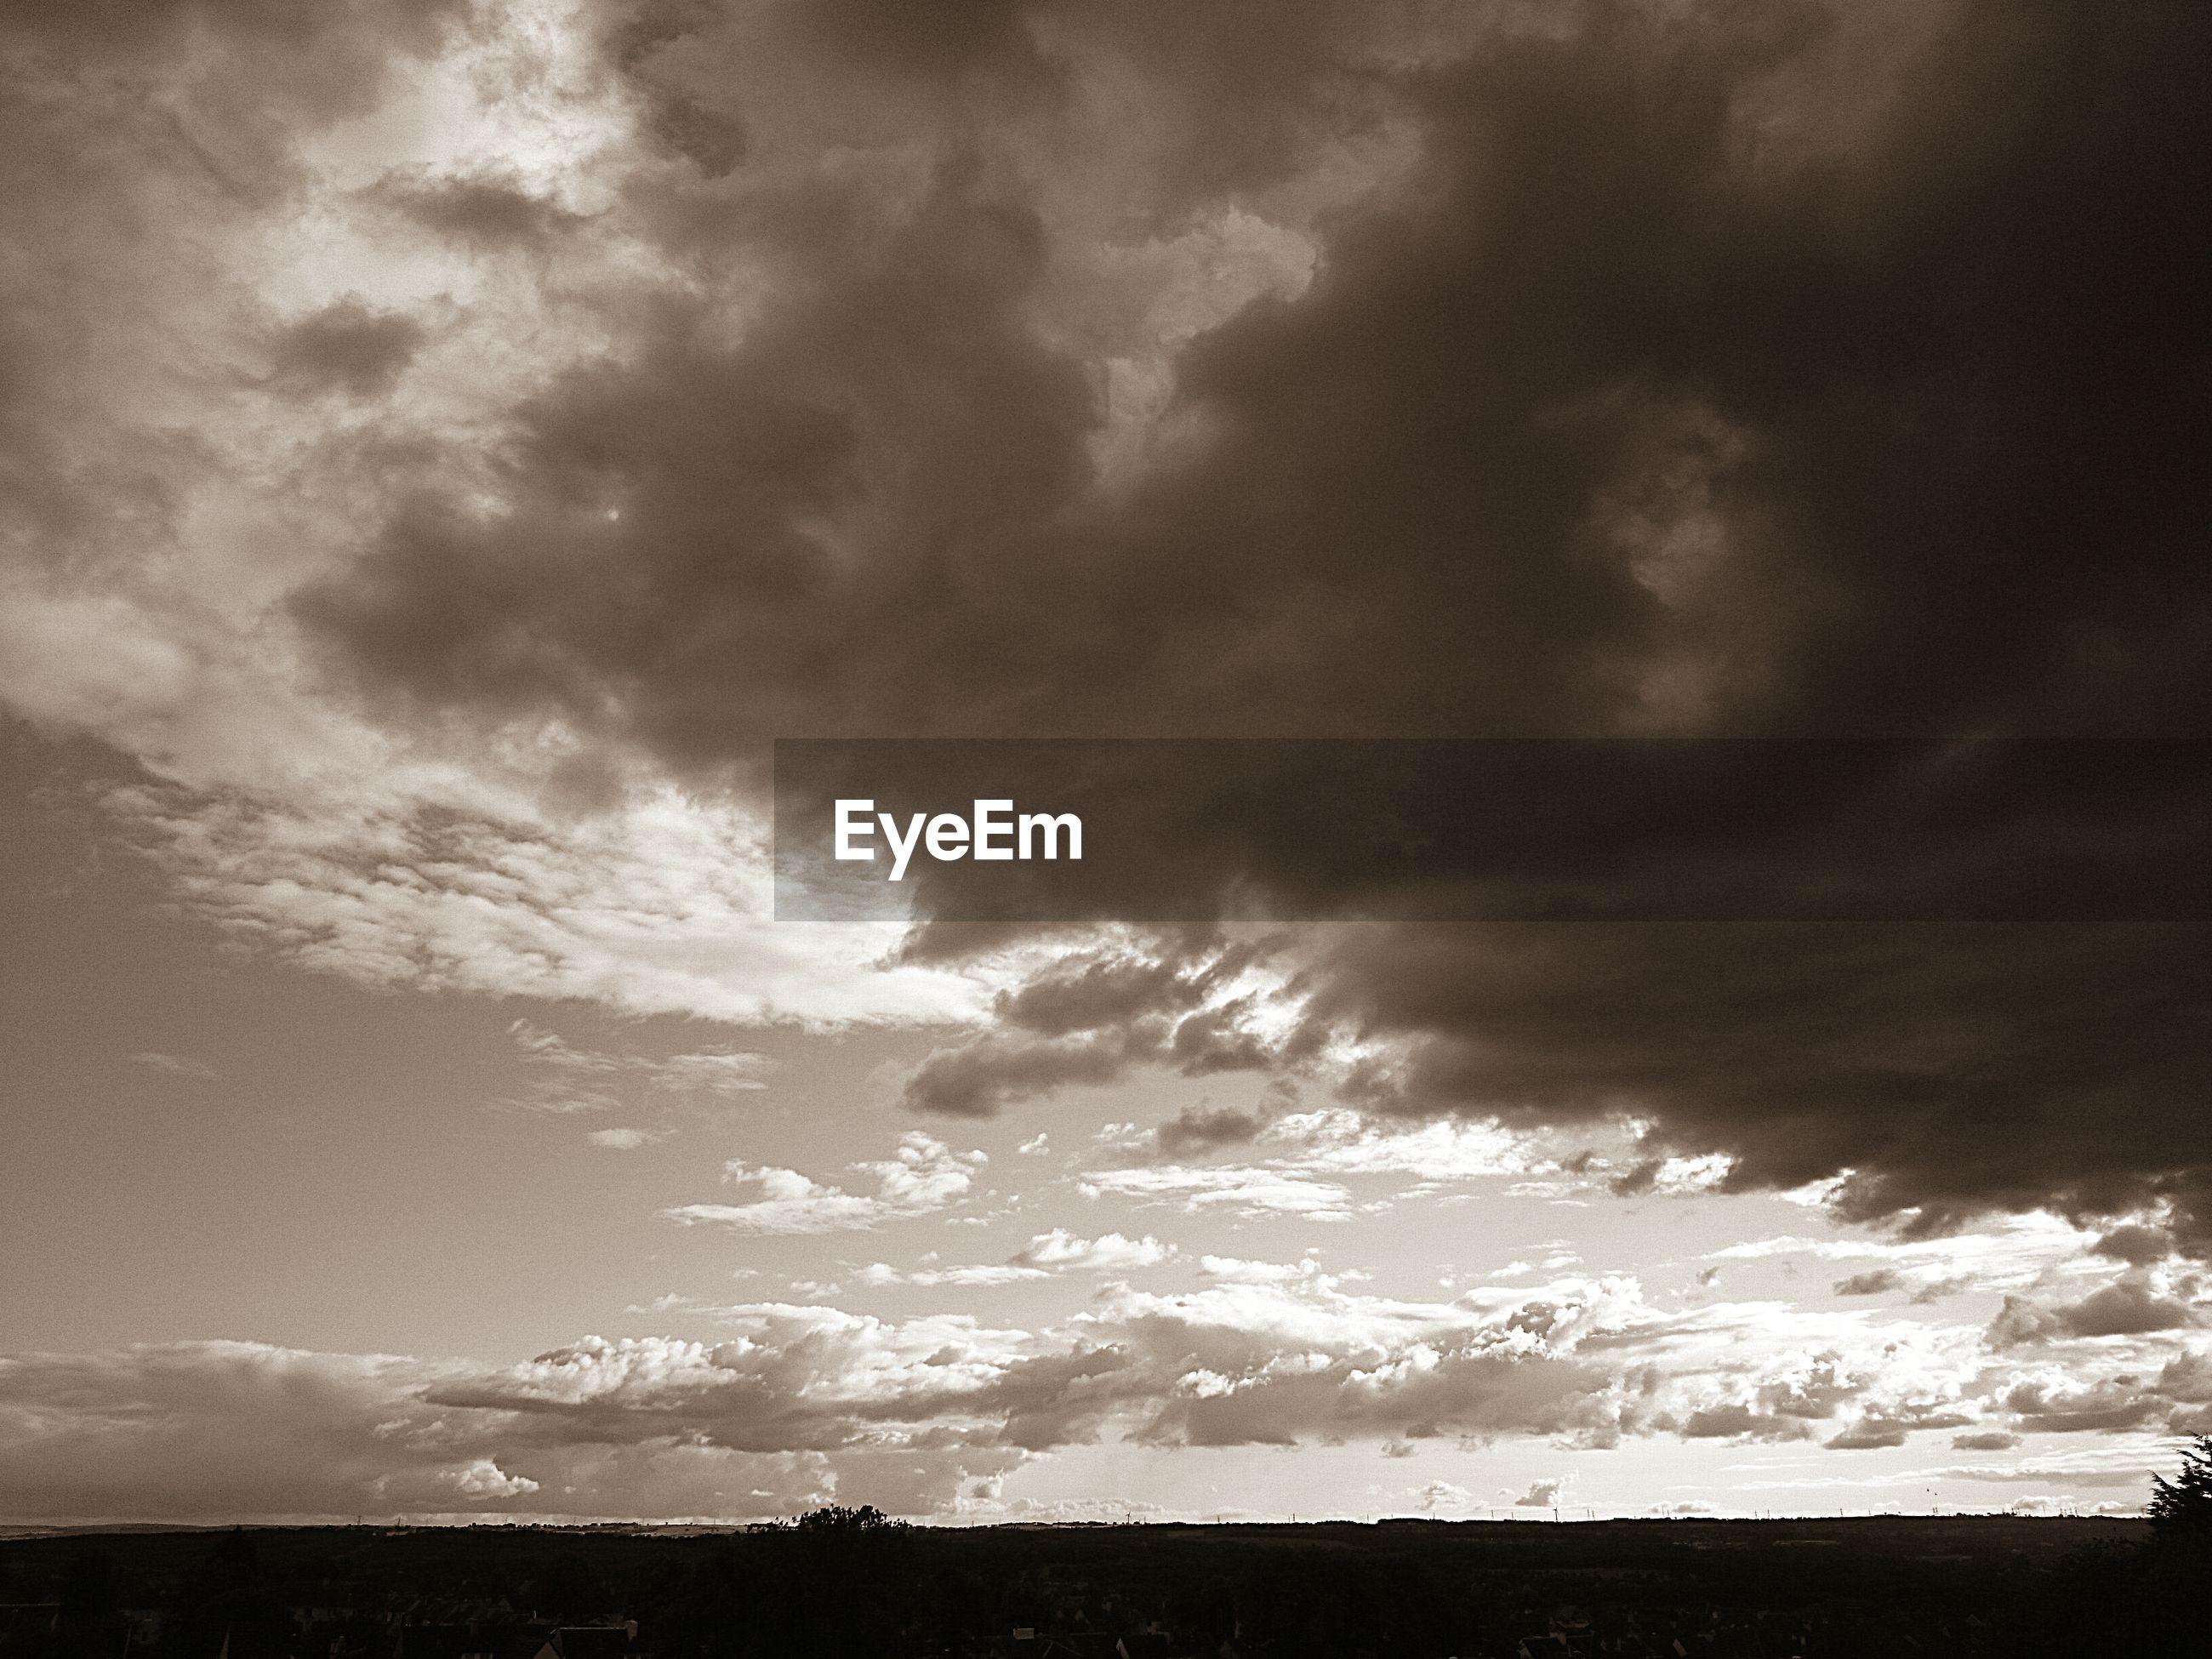 sky, cloud - sky, cloudy, scenics, tranquil scene, tranquility, beauty in nature, weather, overcast, nature, storm cloud, landscape, cloud, dramatic sky, cloudscape, idyllic, dusk, field, silhouette, atmospheric mood